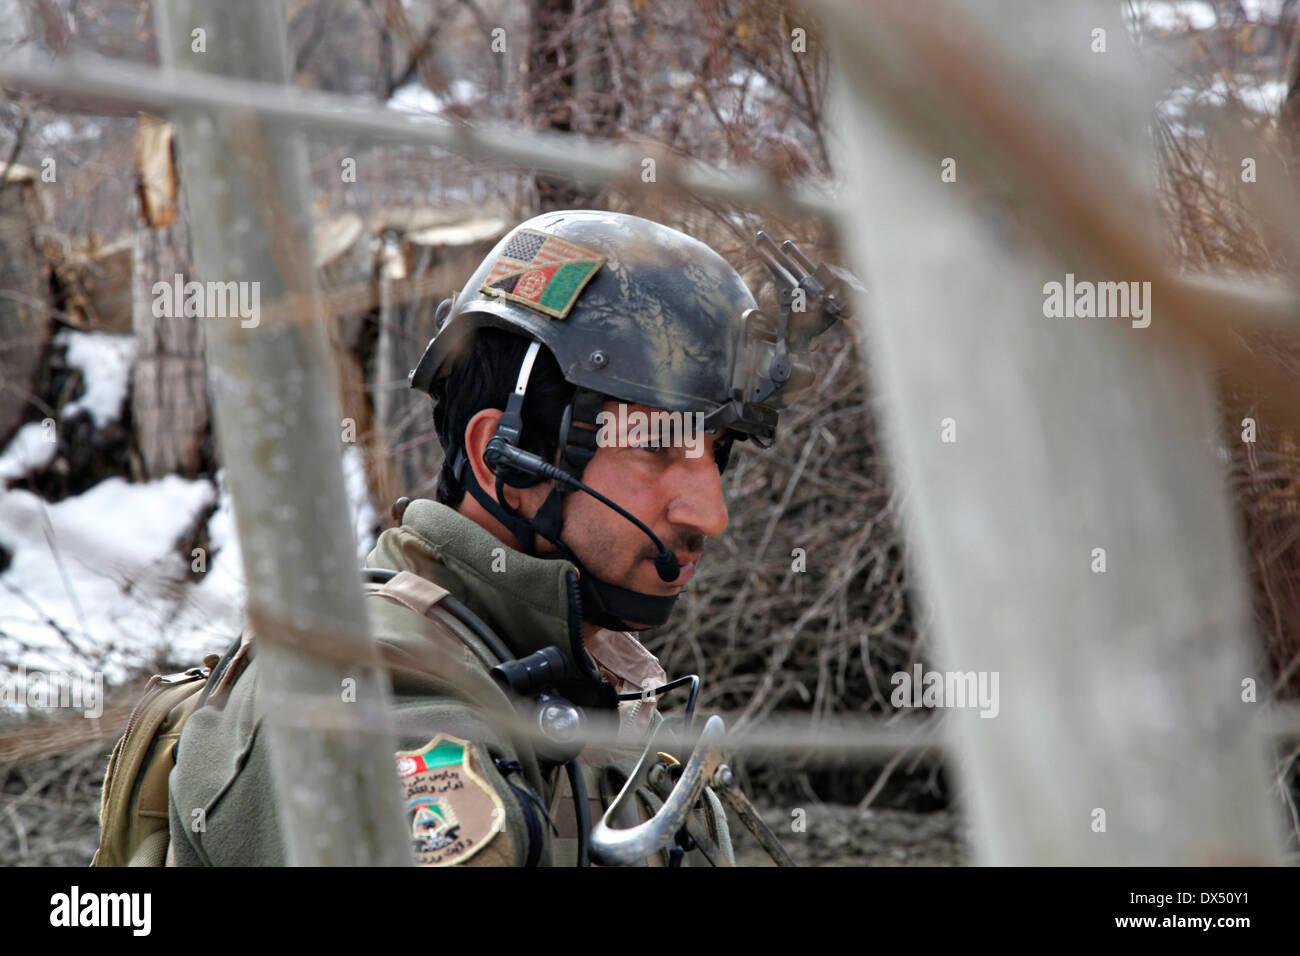 An Afghan patrolman with Task Unit Wardak during an armed reconnaissance operation March 6, 2014 in Zabodaq village, Wardak province, Afghanistan. - Stock Image